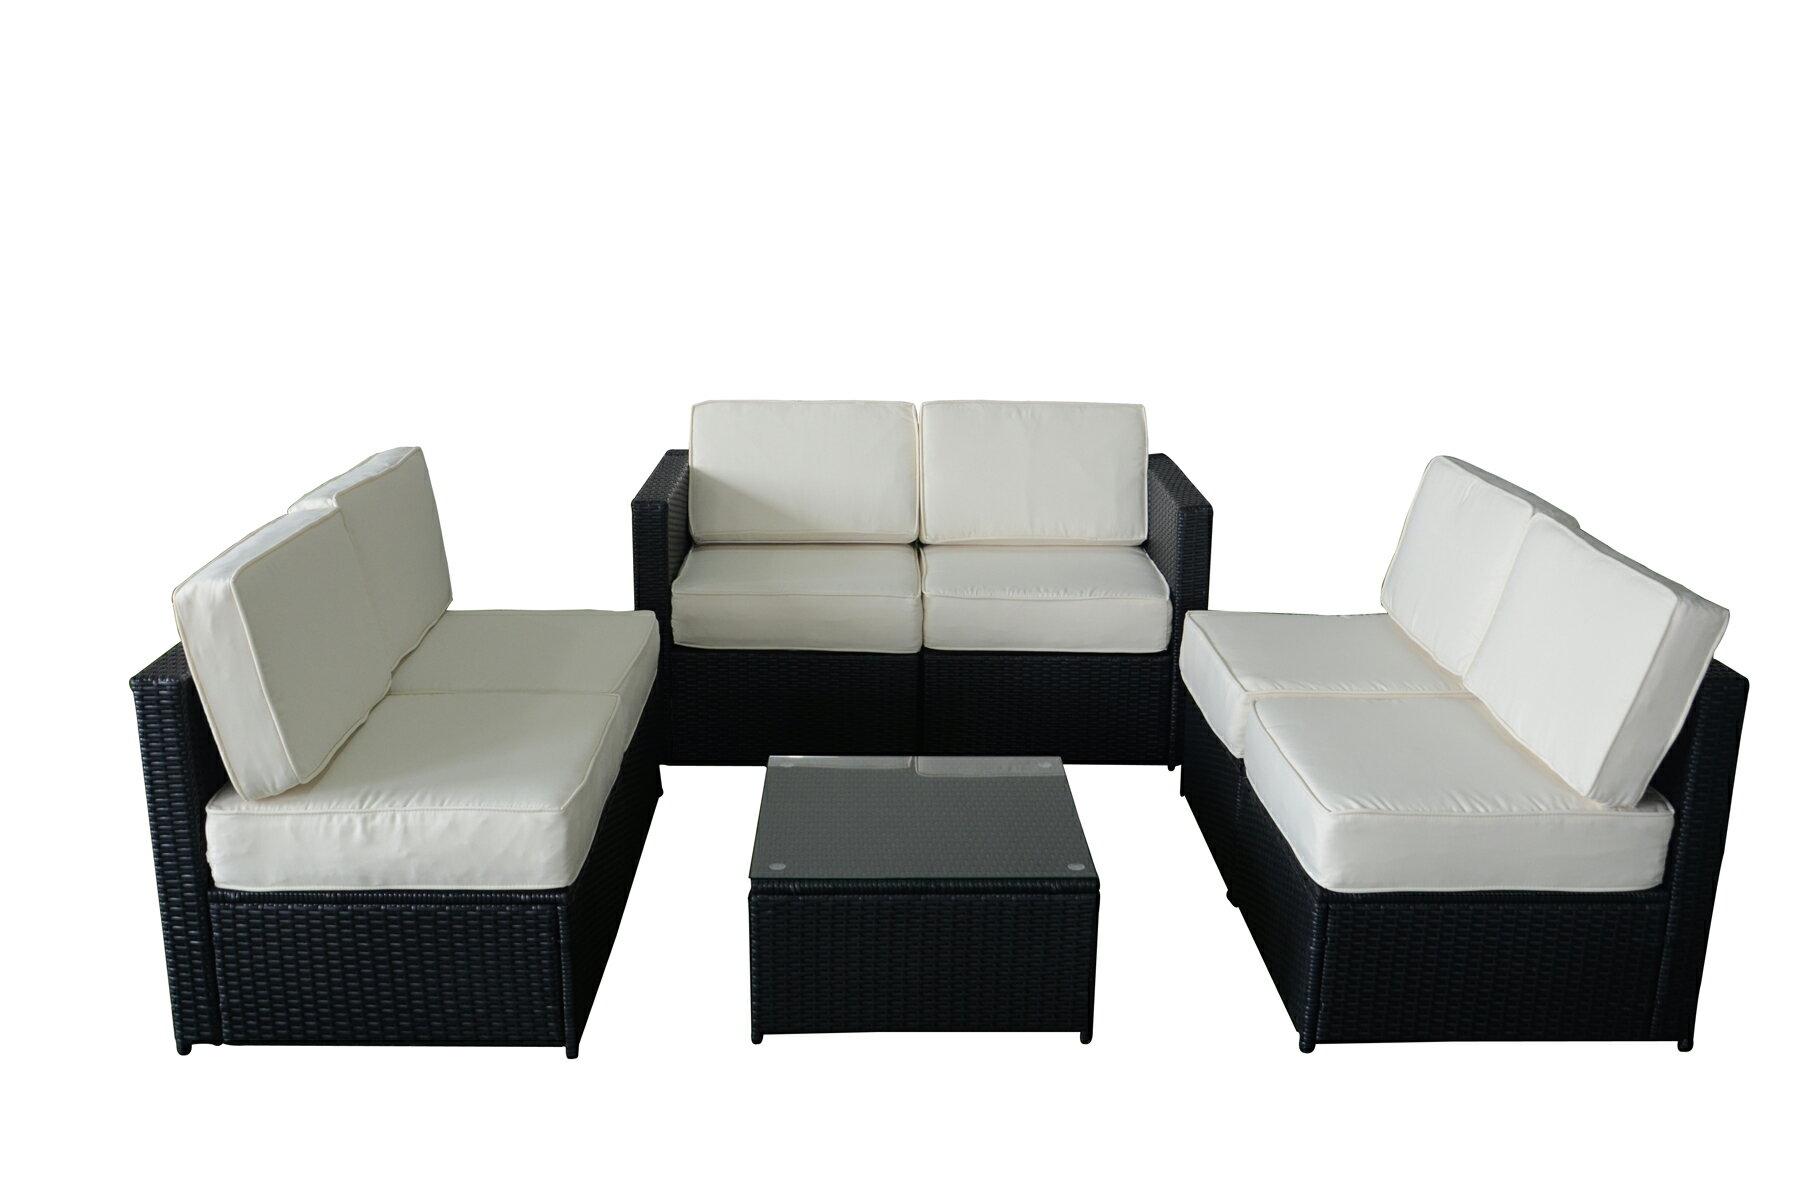 MCombo 7pcs Black Wicker White Cushion Patio Sectional Outdoor Sofa  Furniture Set 6085 S1007